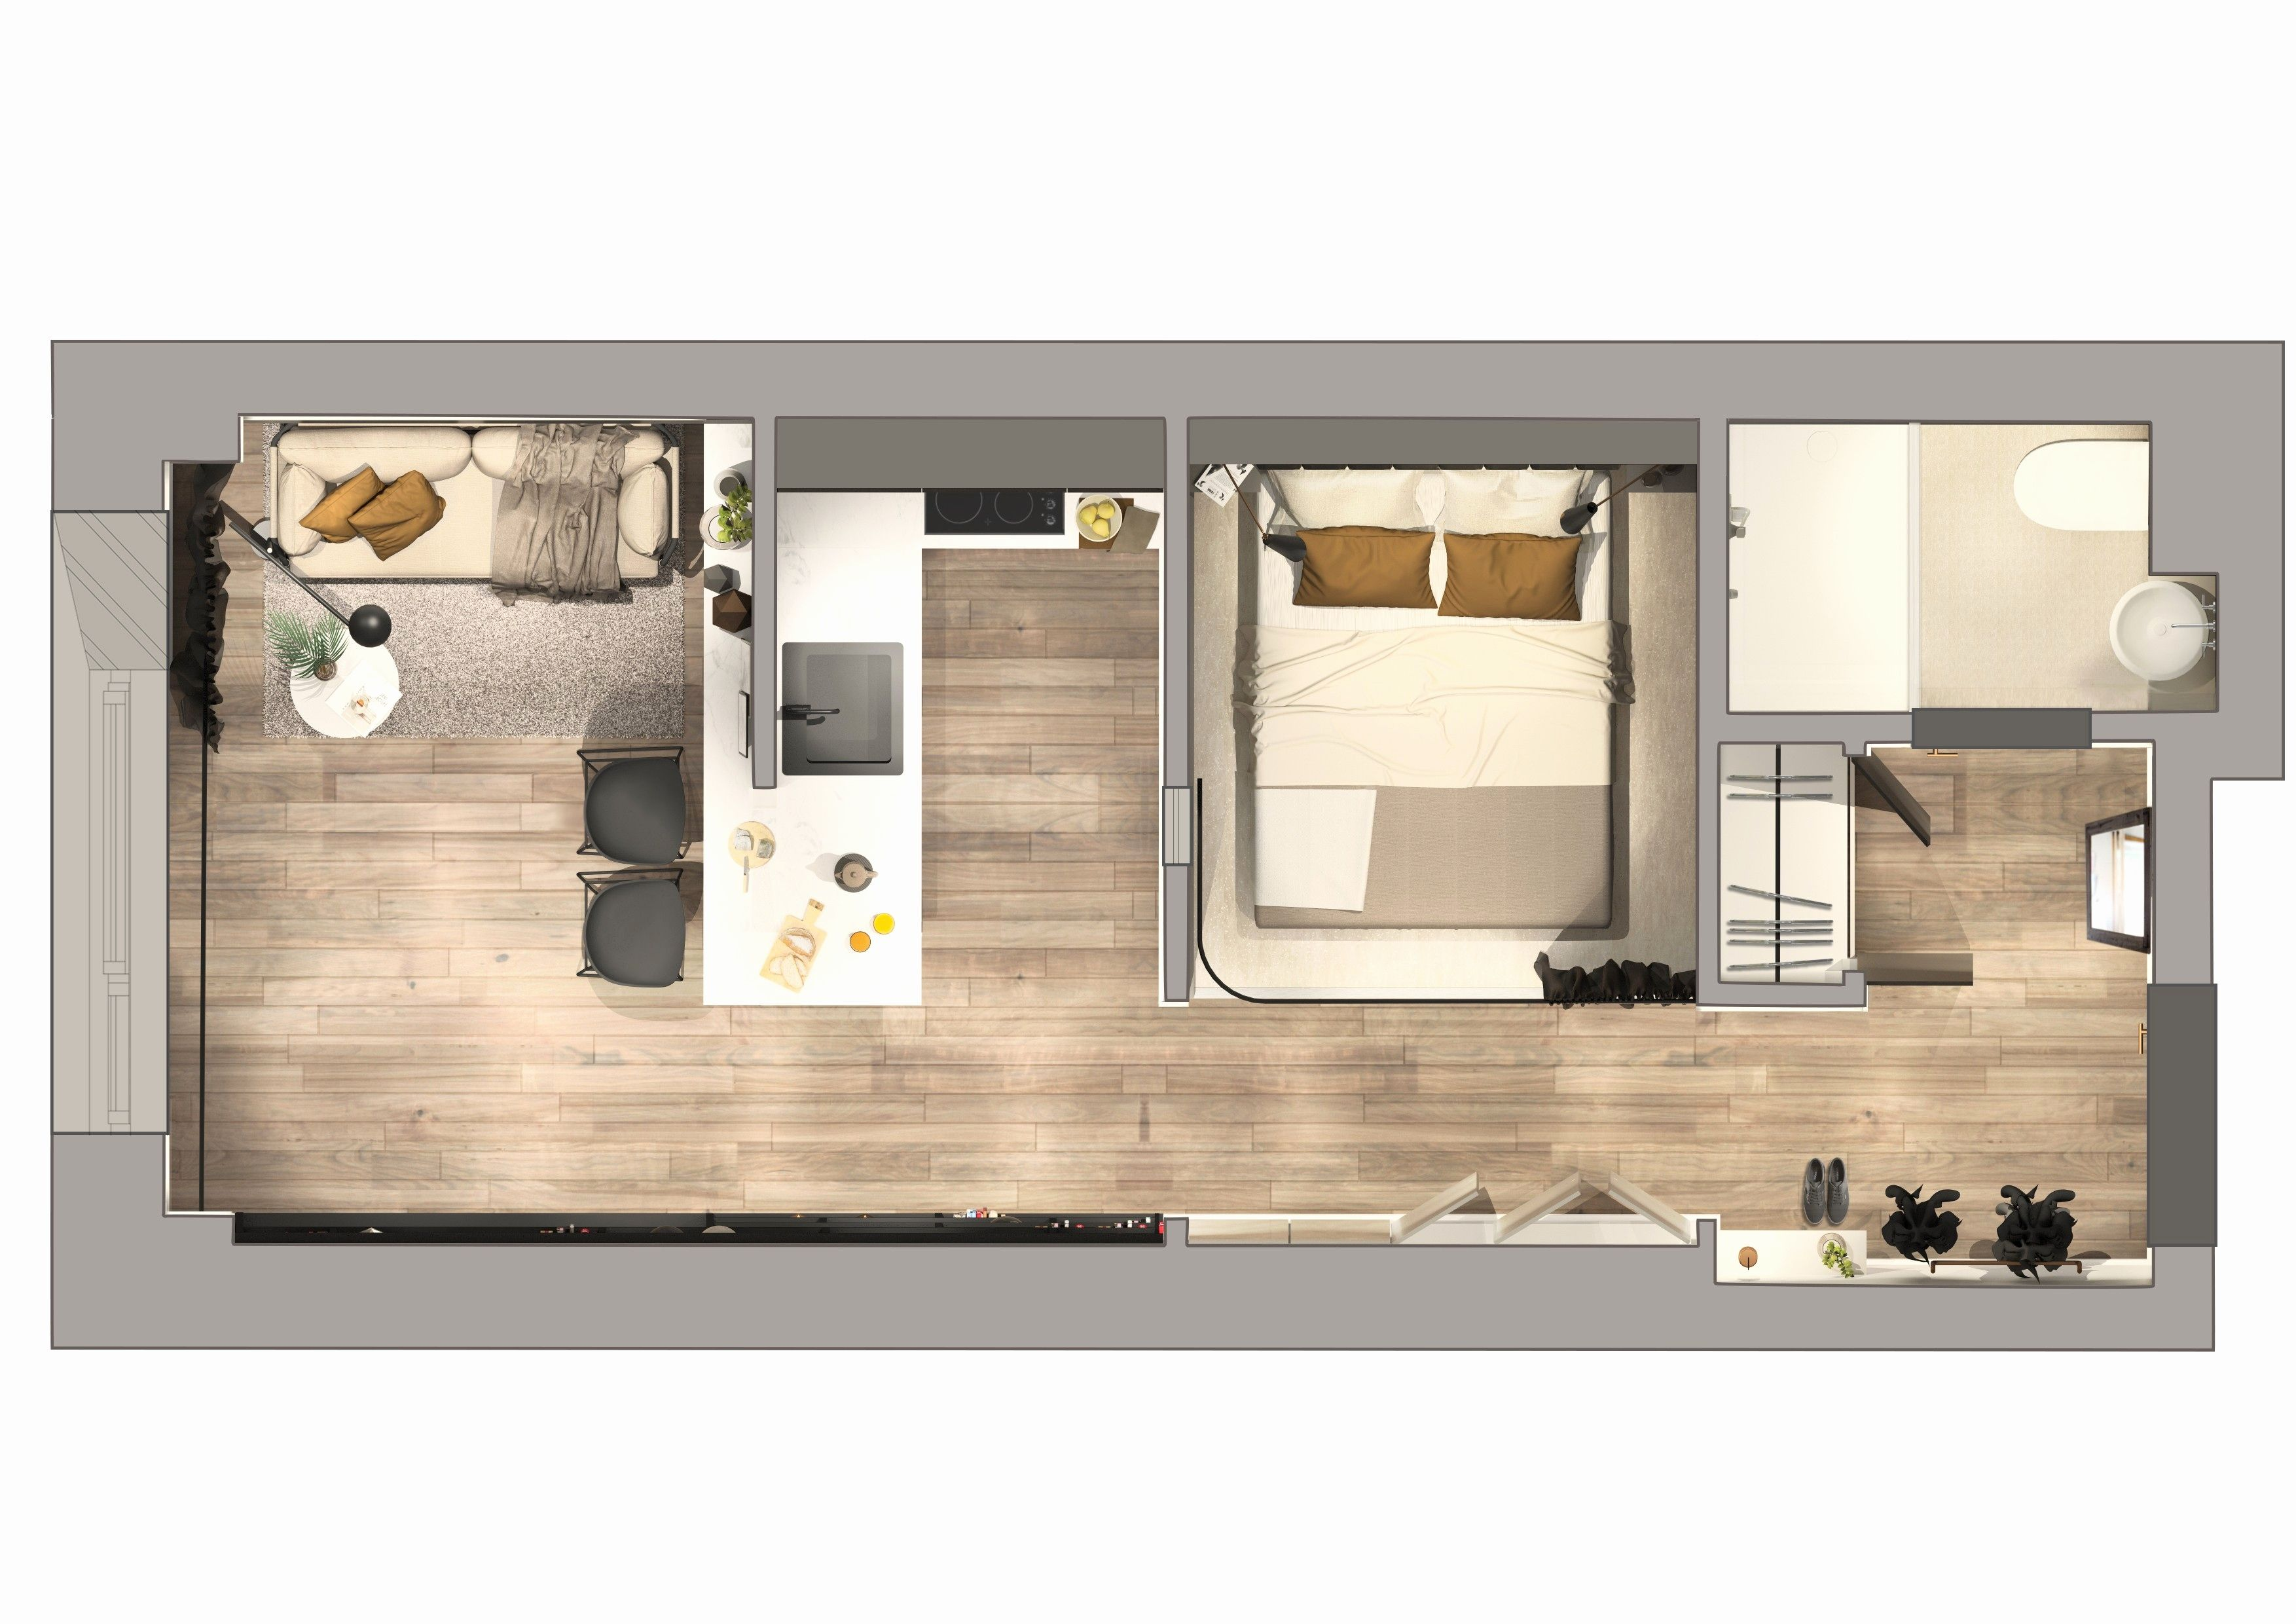 Amenager Studio 30 M2 | Интерьер зала 18 кв м двери потолок ...